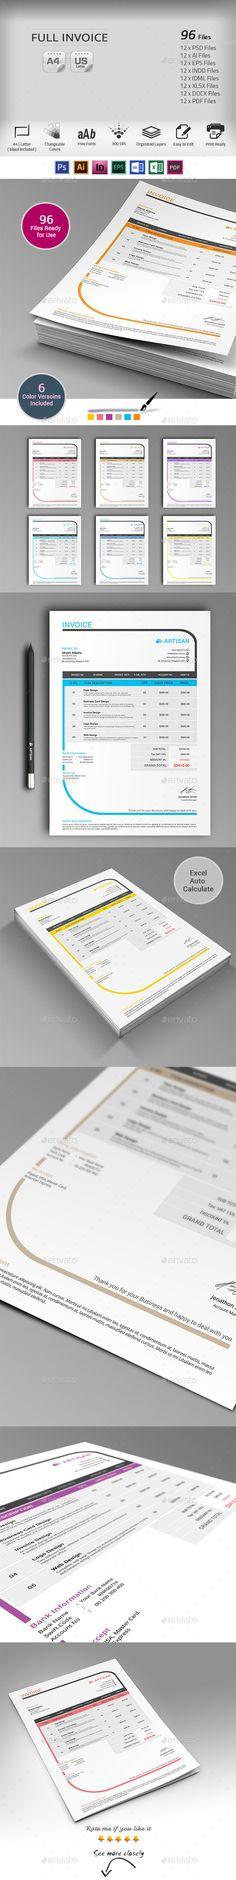 Invoice Template | #invoice #invoicetemplate | Download: http://graphicriver.net/item/invoice/10091006?ref=ksioks